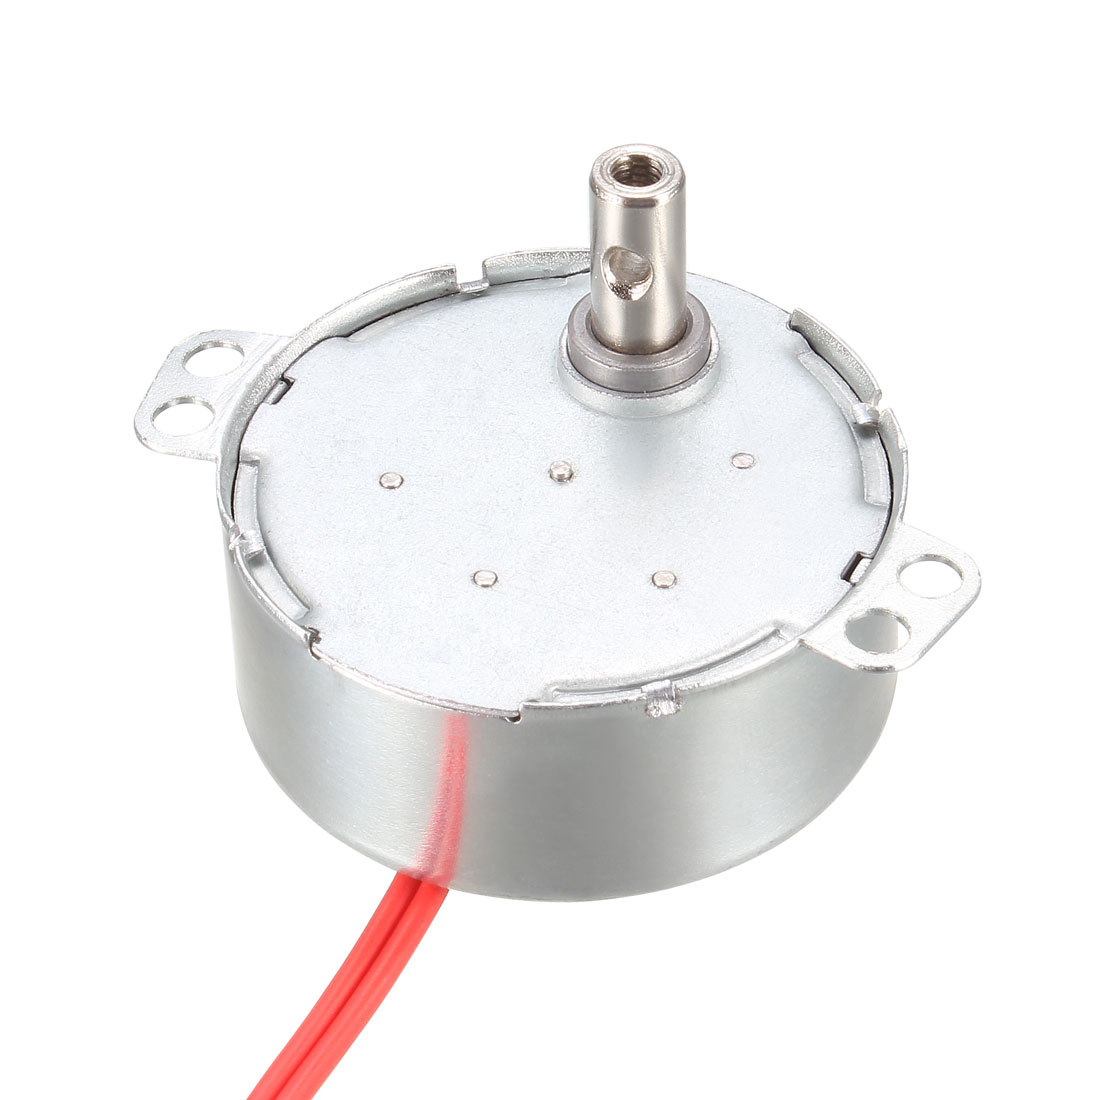 Synchronous Synchron Motor - Turntable Motor AC 24V 50-60Hz CCW/CW 4W 9-11RPM